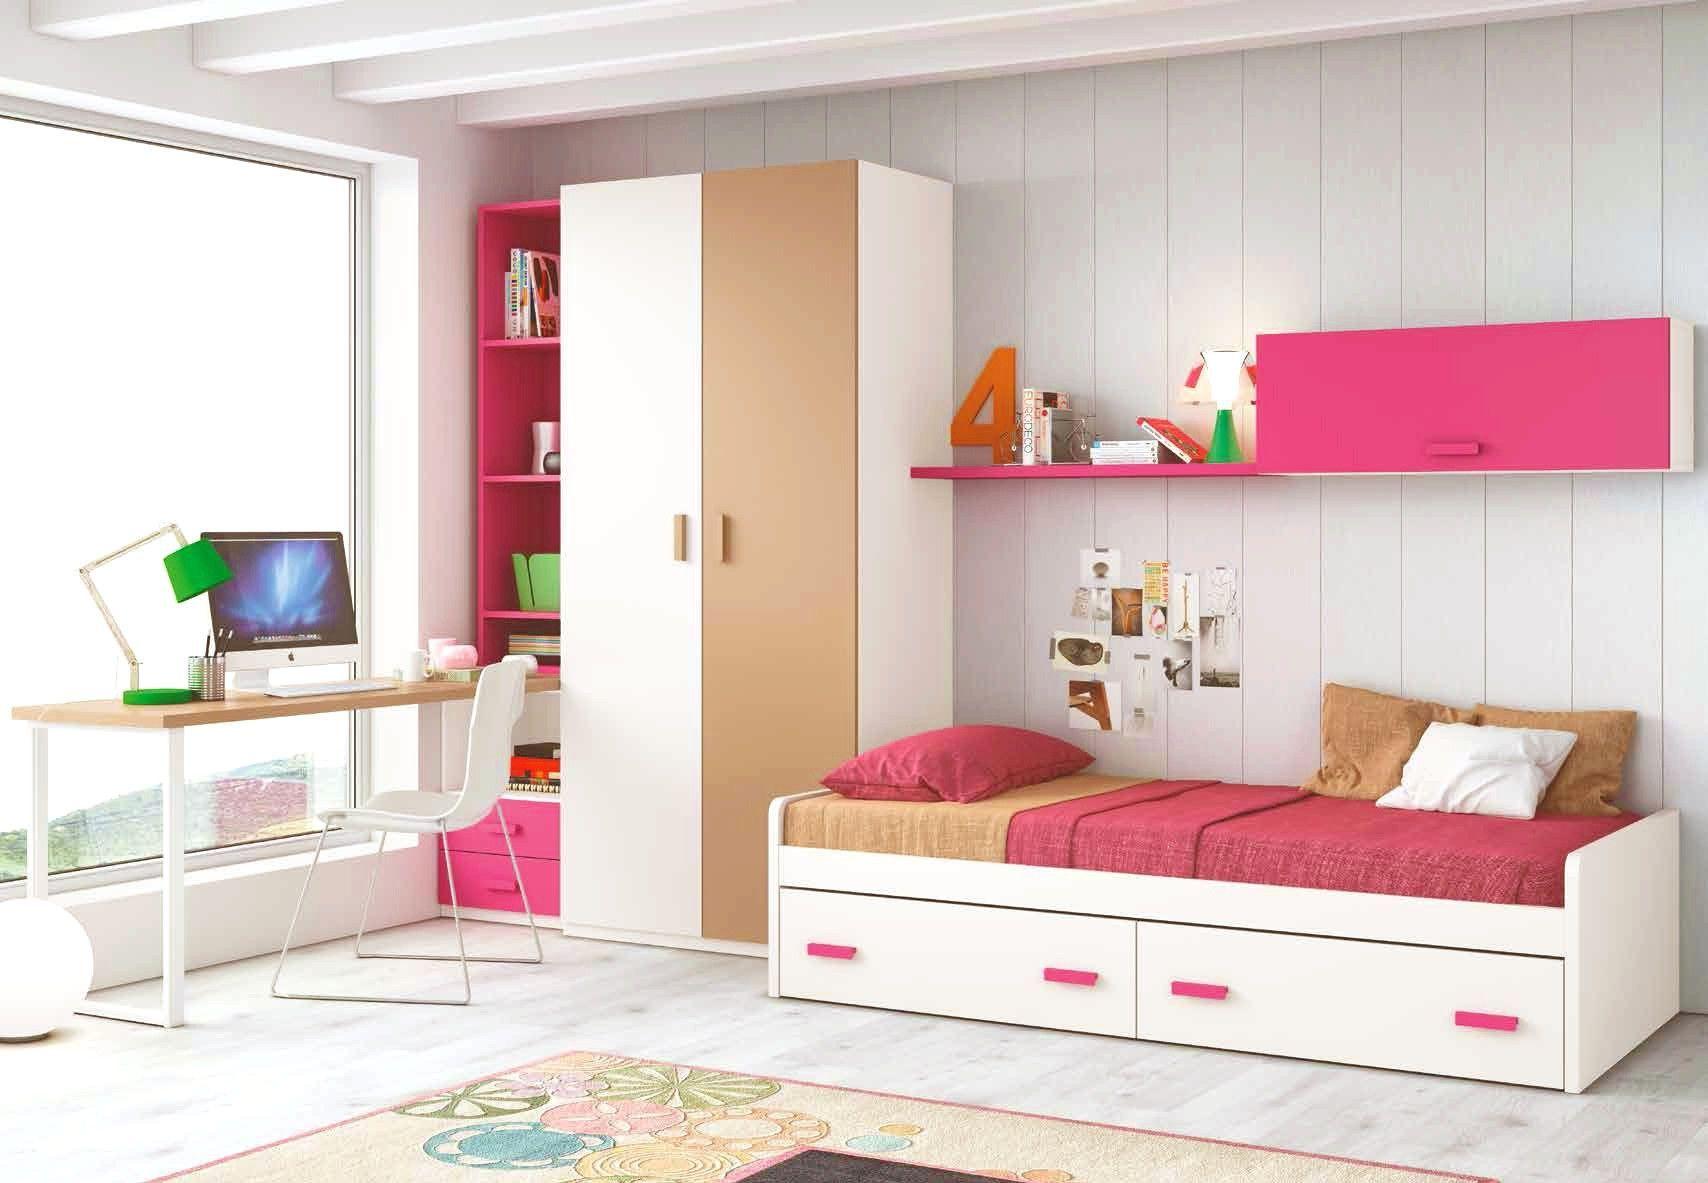 Lovely Chambre De Fille De 13 Ans Modern Room Interior Design